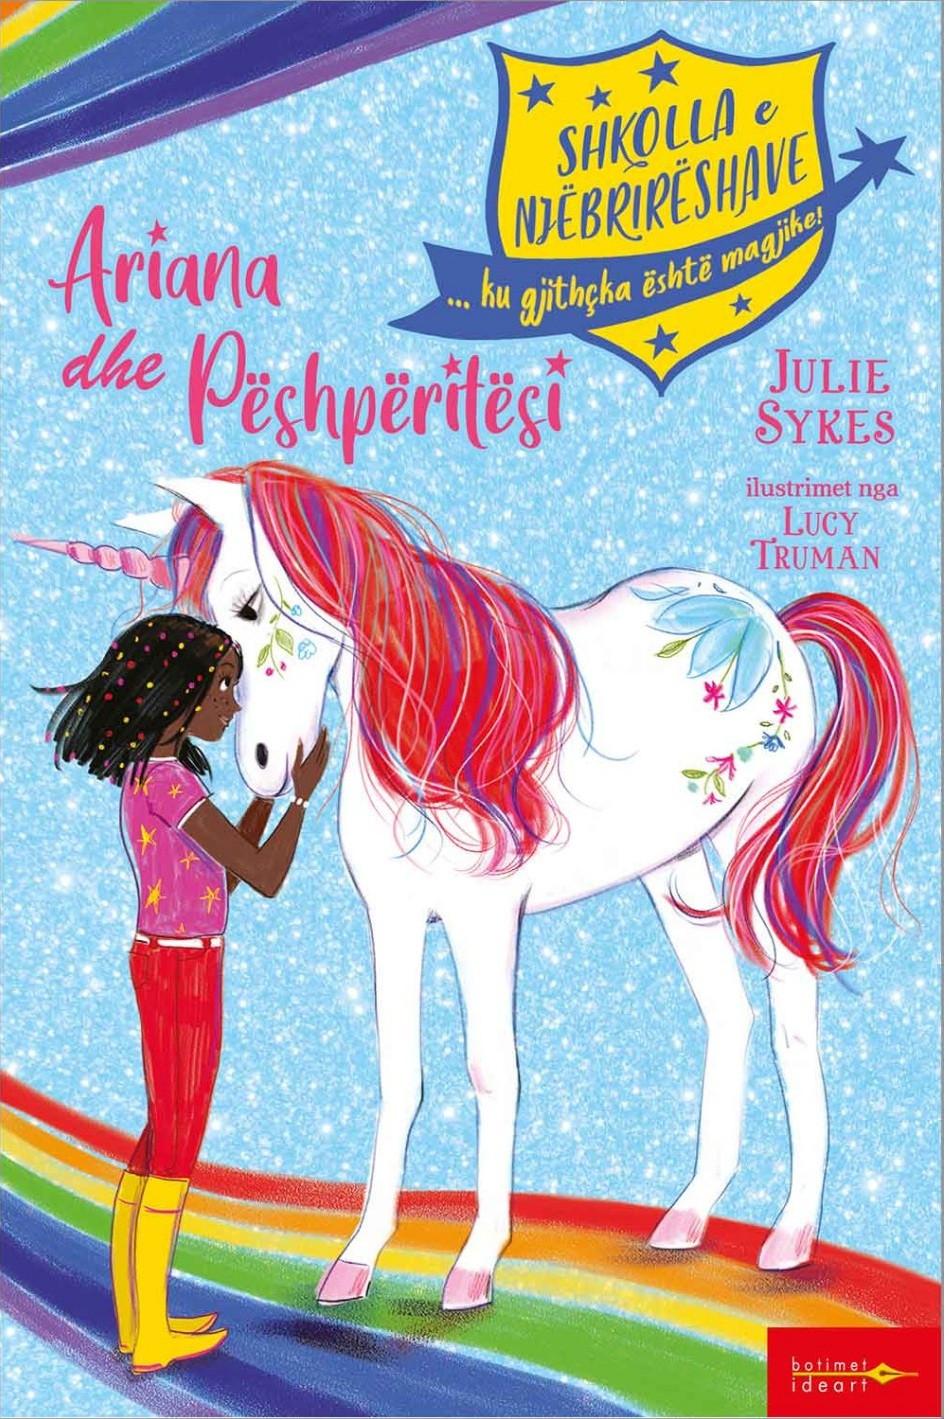 Shkolla enjebrireshave - Ariana dhe peshperitesi